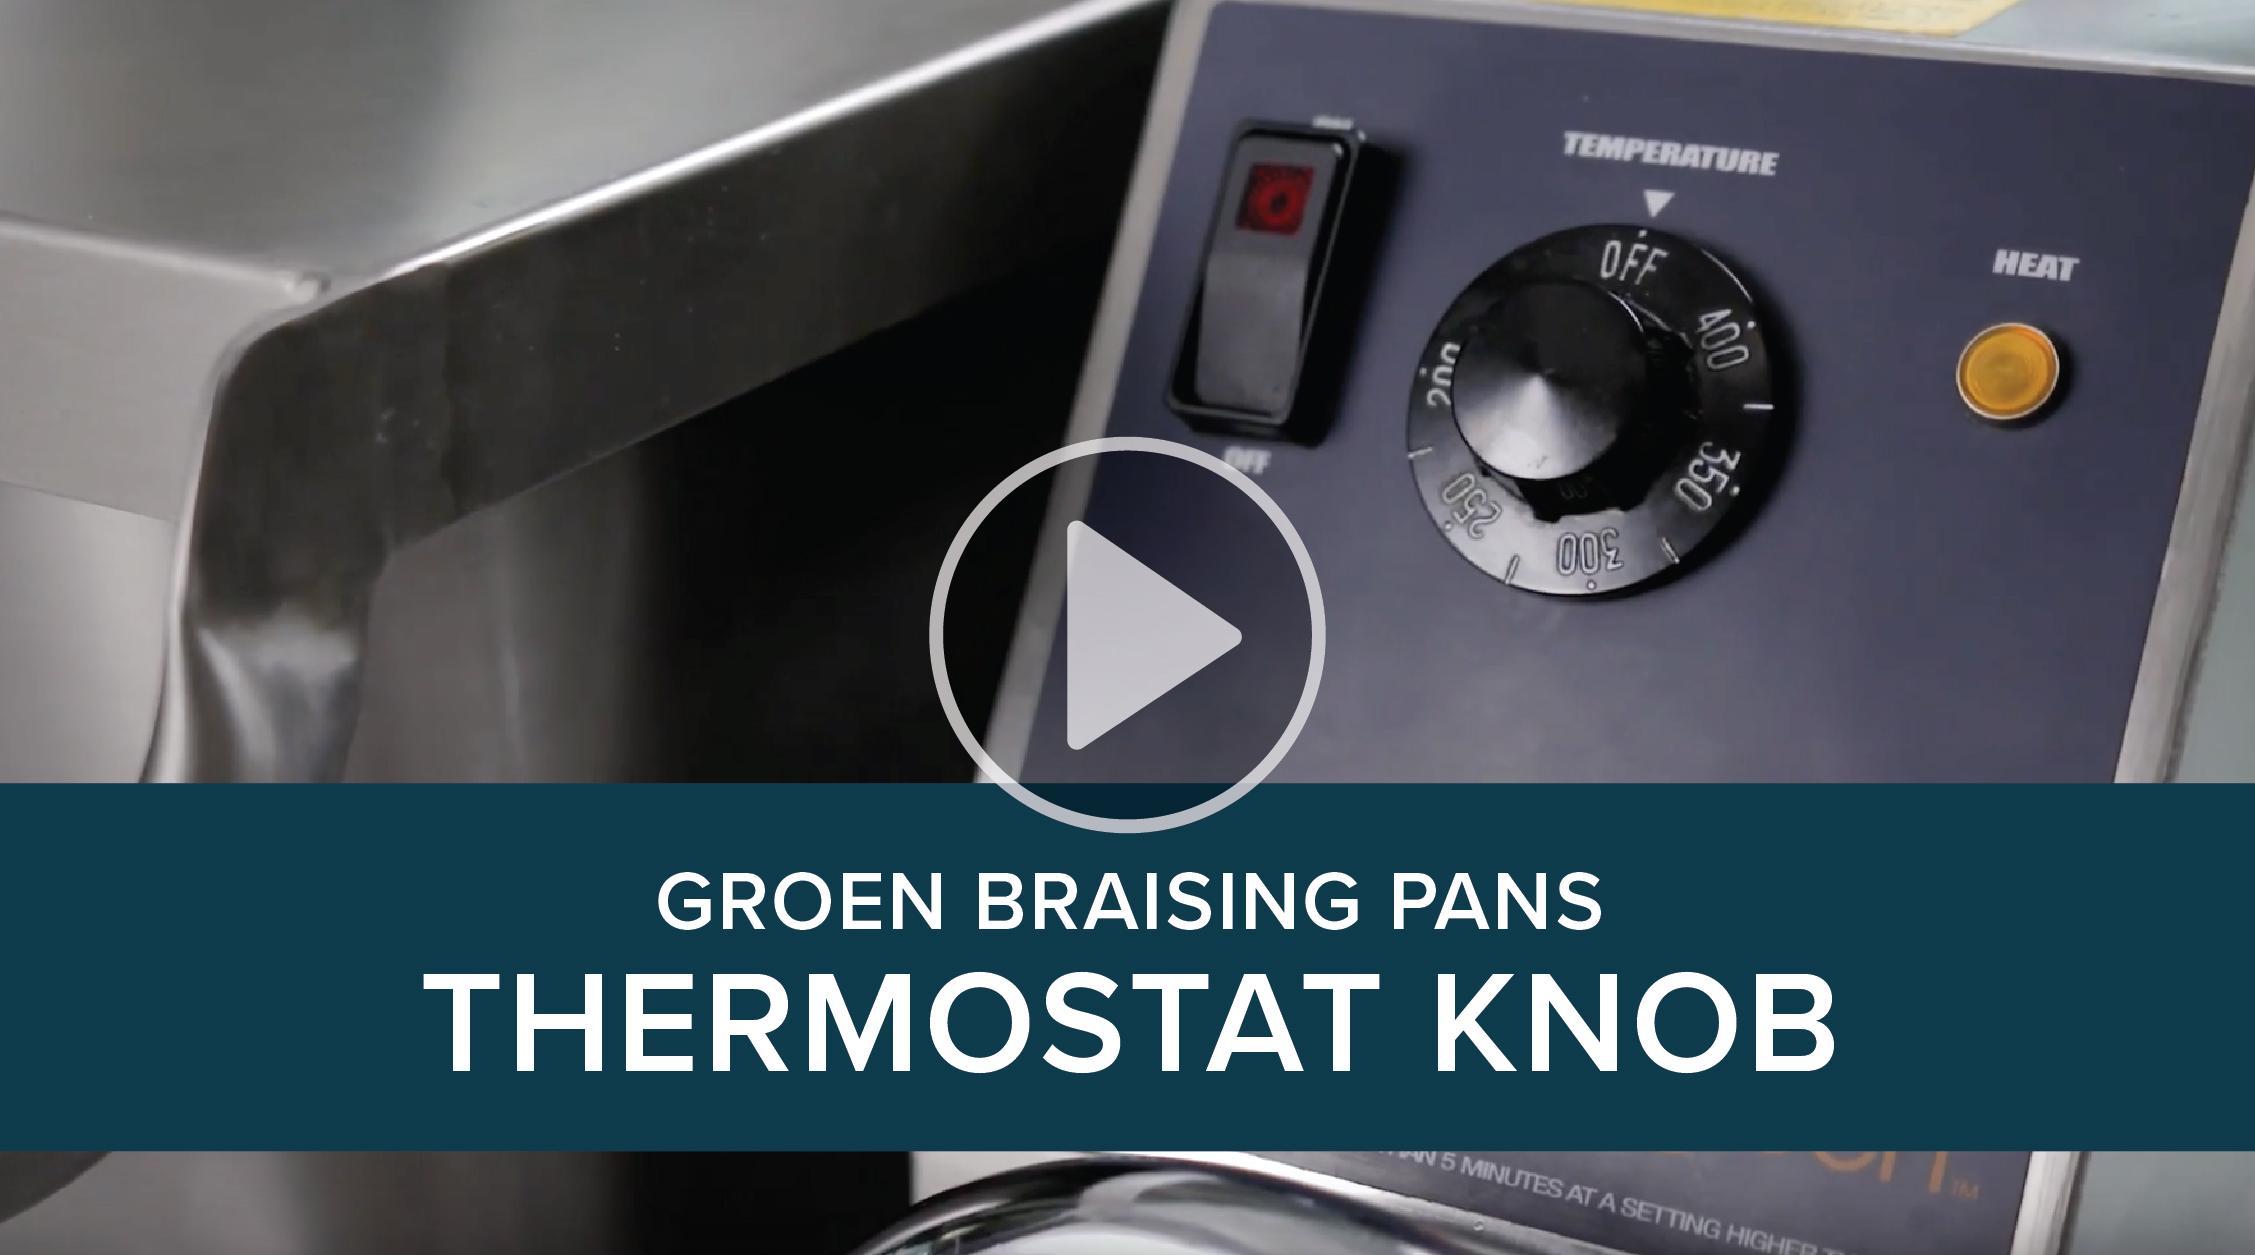 Groen Braising Pans Thermostat Knob